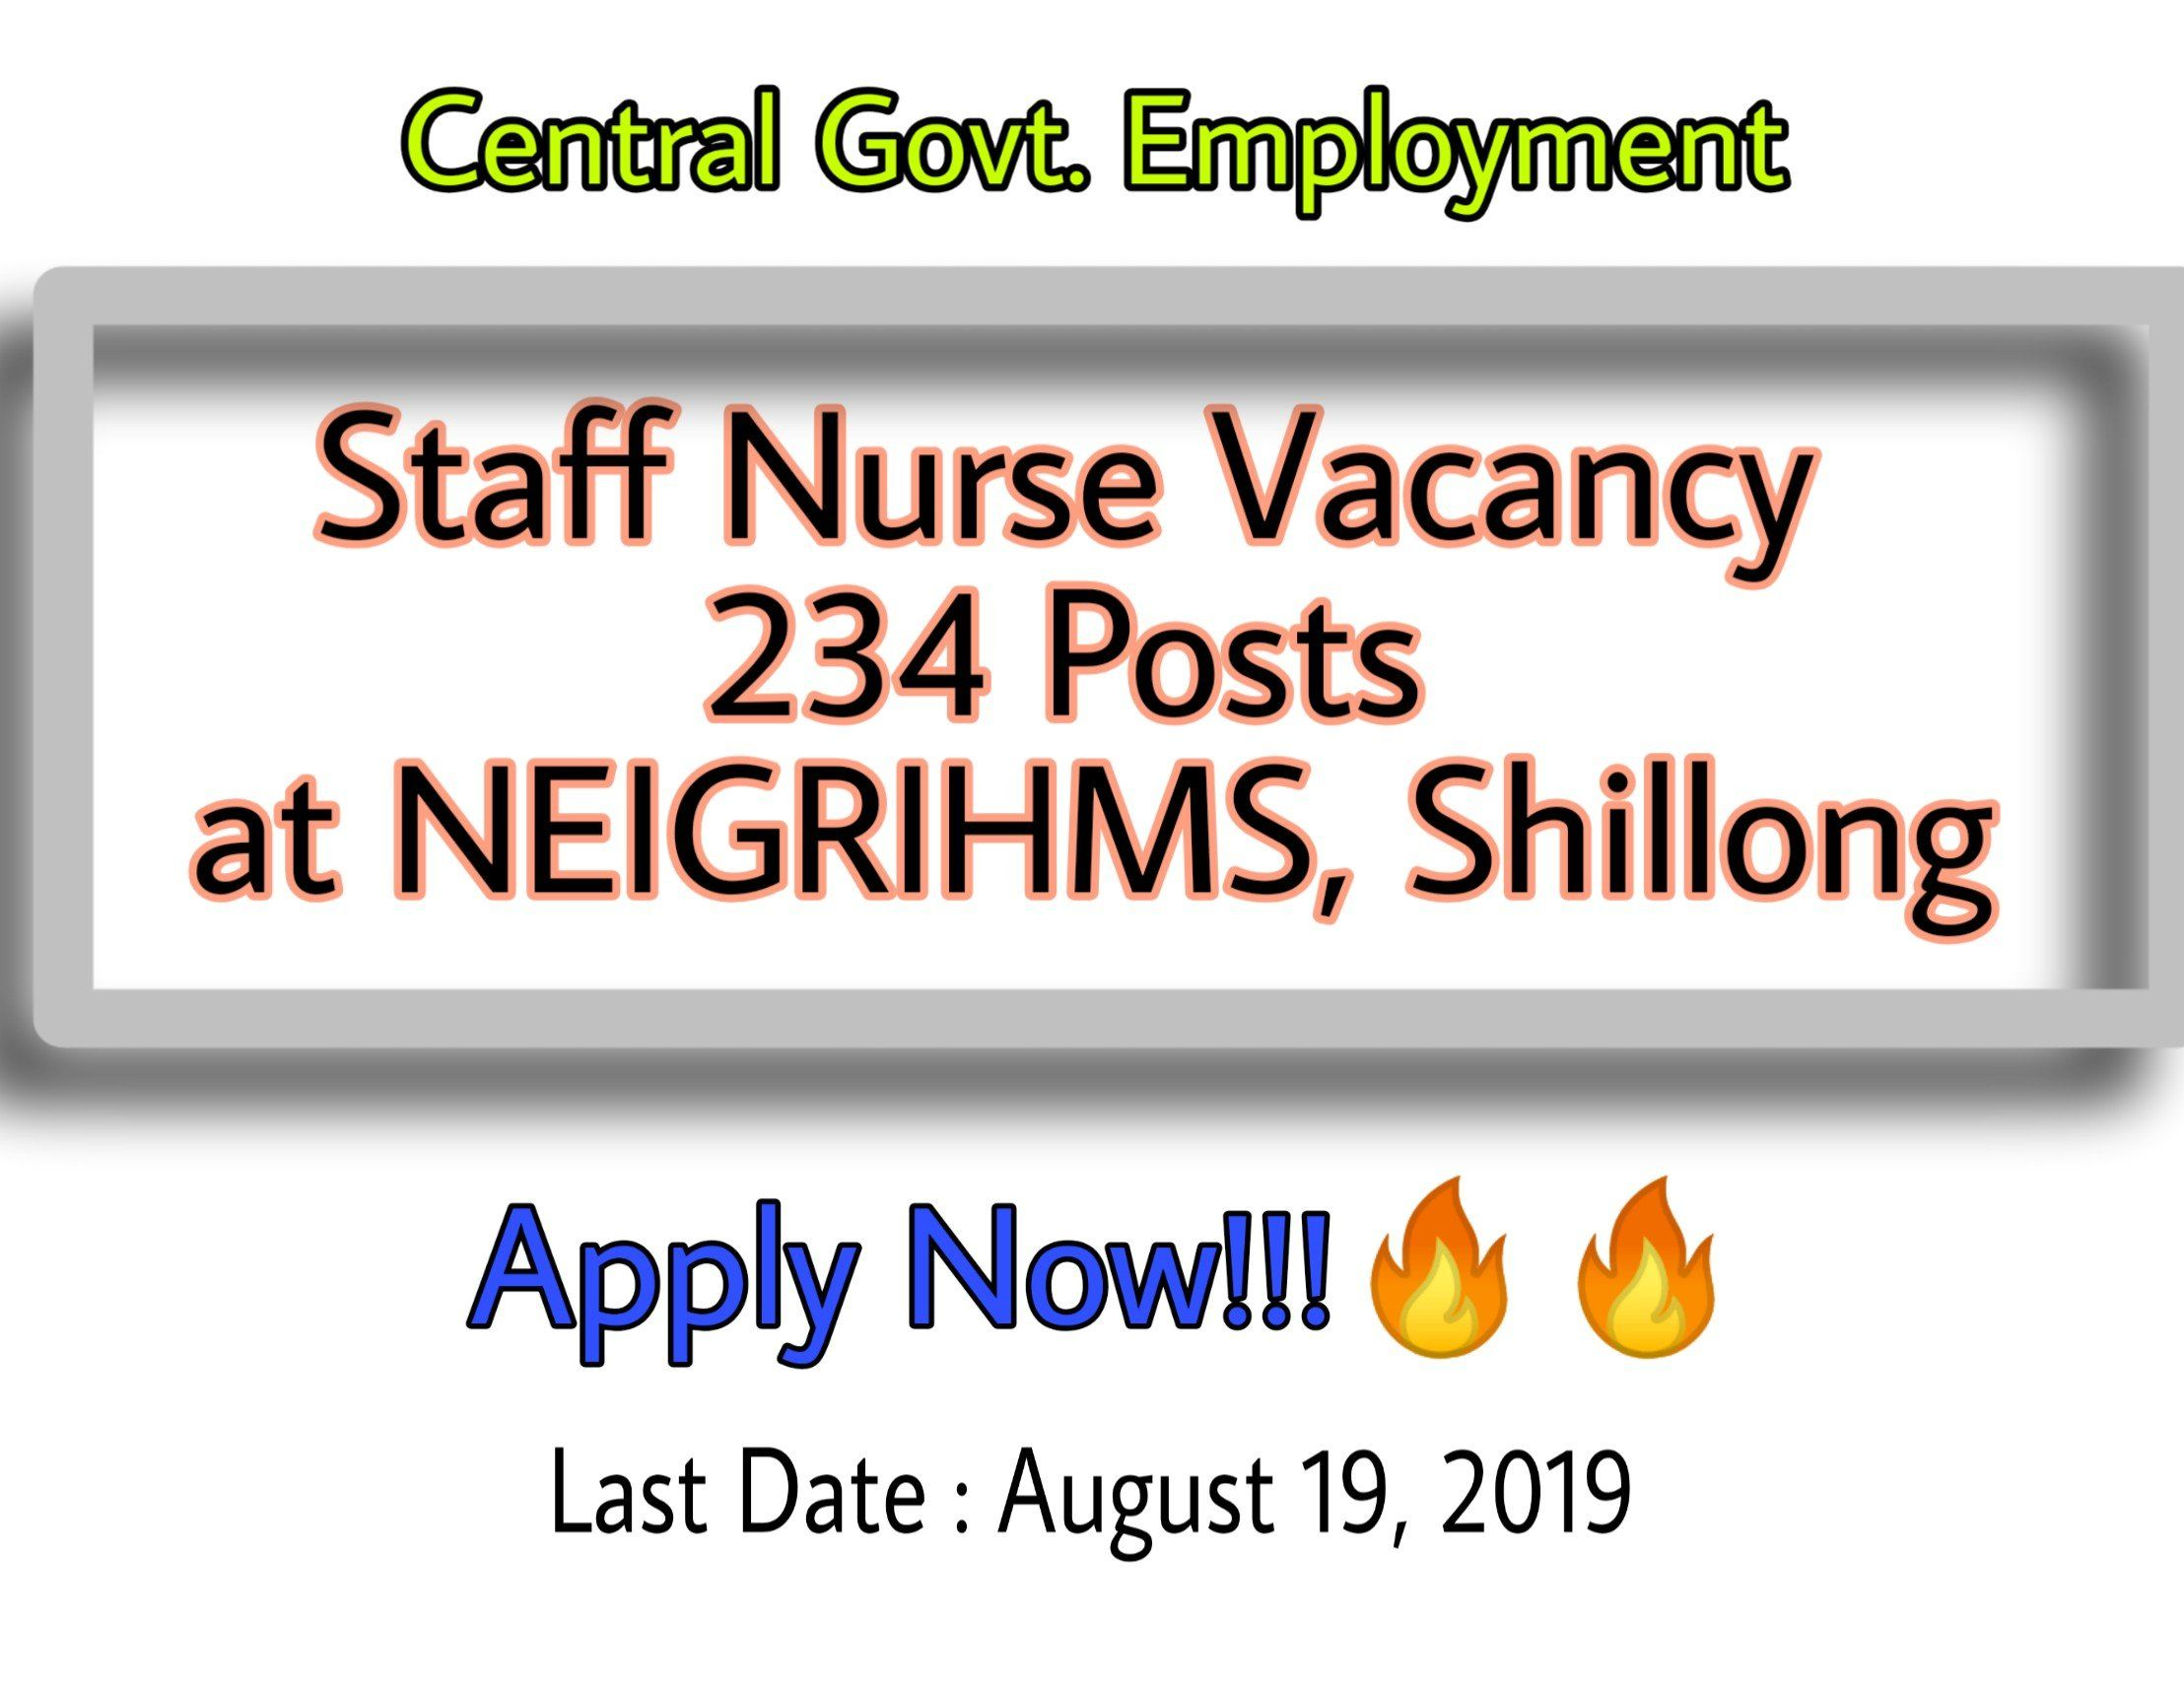 Staff Nurse Vacancy at NEIGRIHMS Shillong The Nurse Page